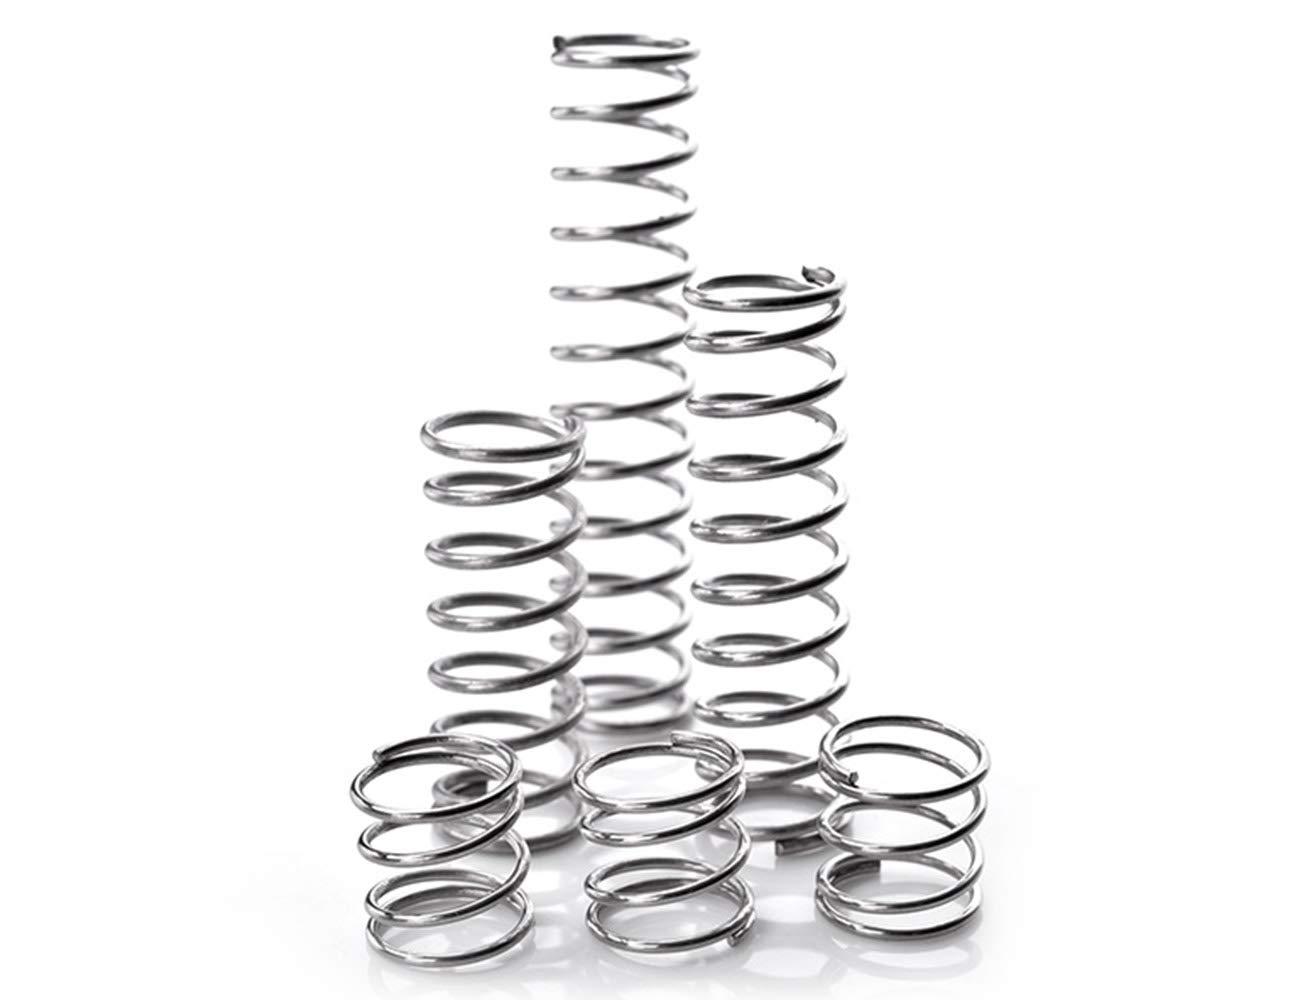 5Pcs Steel Compression Springs Silver Tone 0.02x0.24x0.39